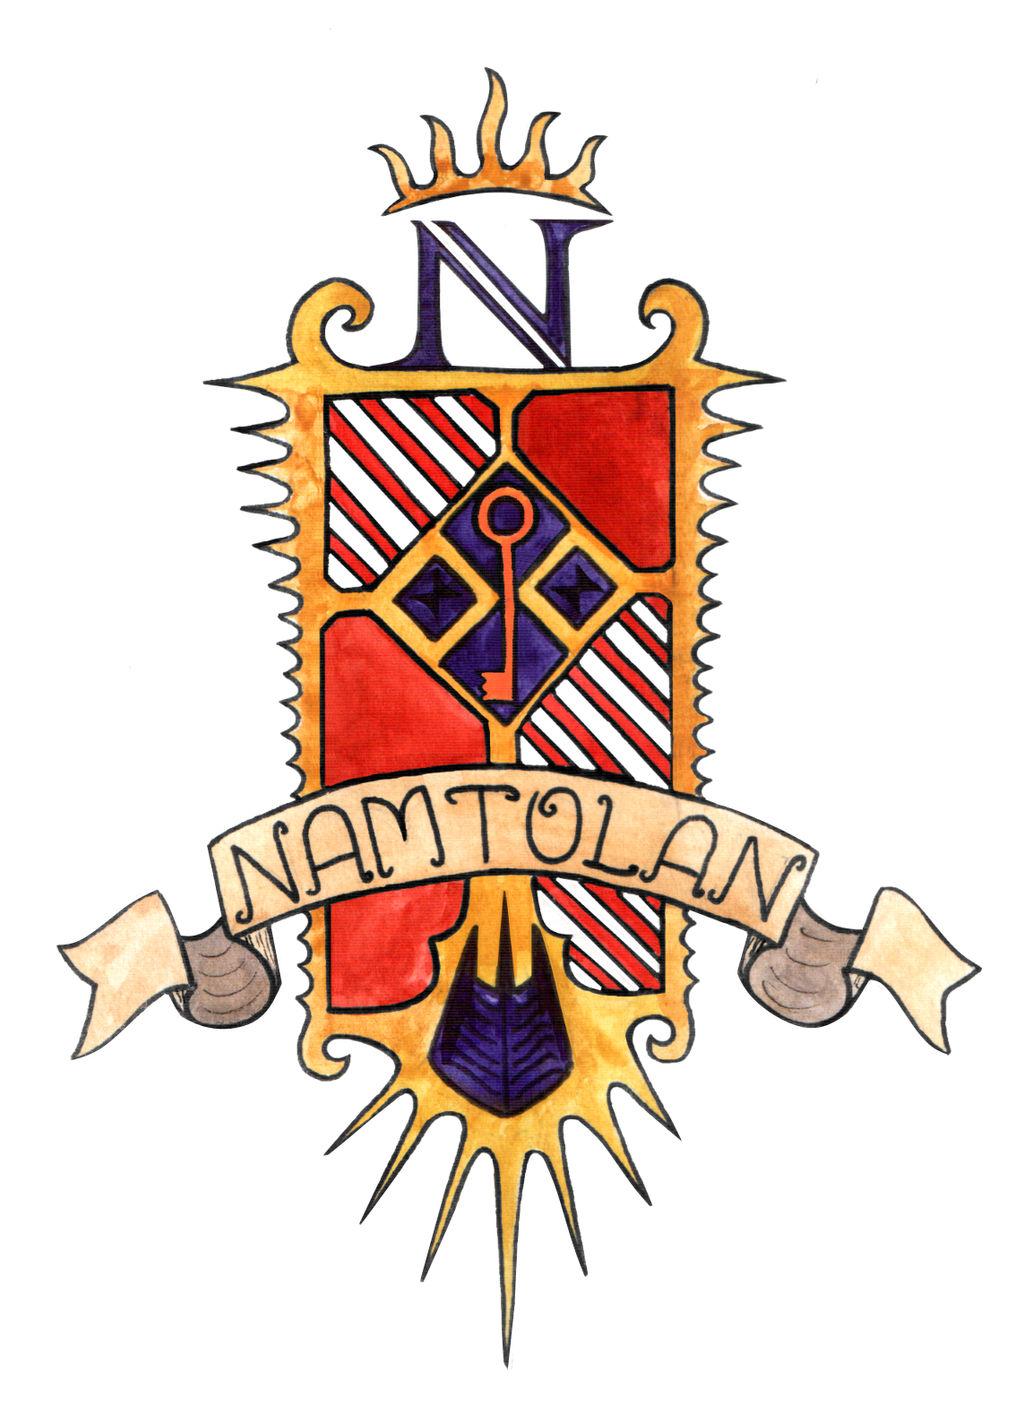 Namtolan Crest by Djigallag